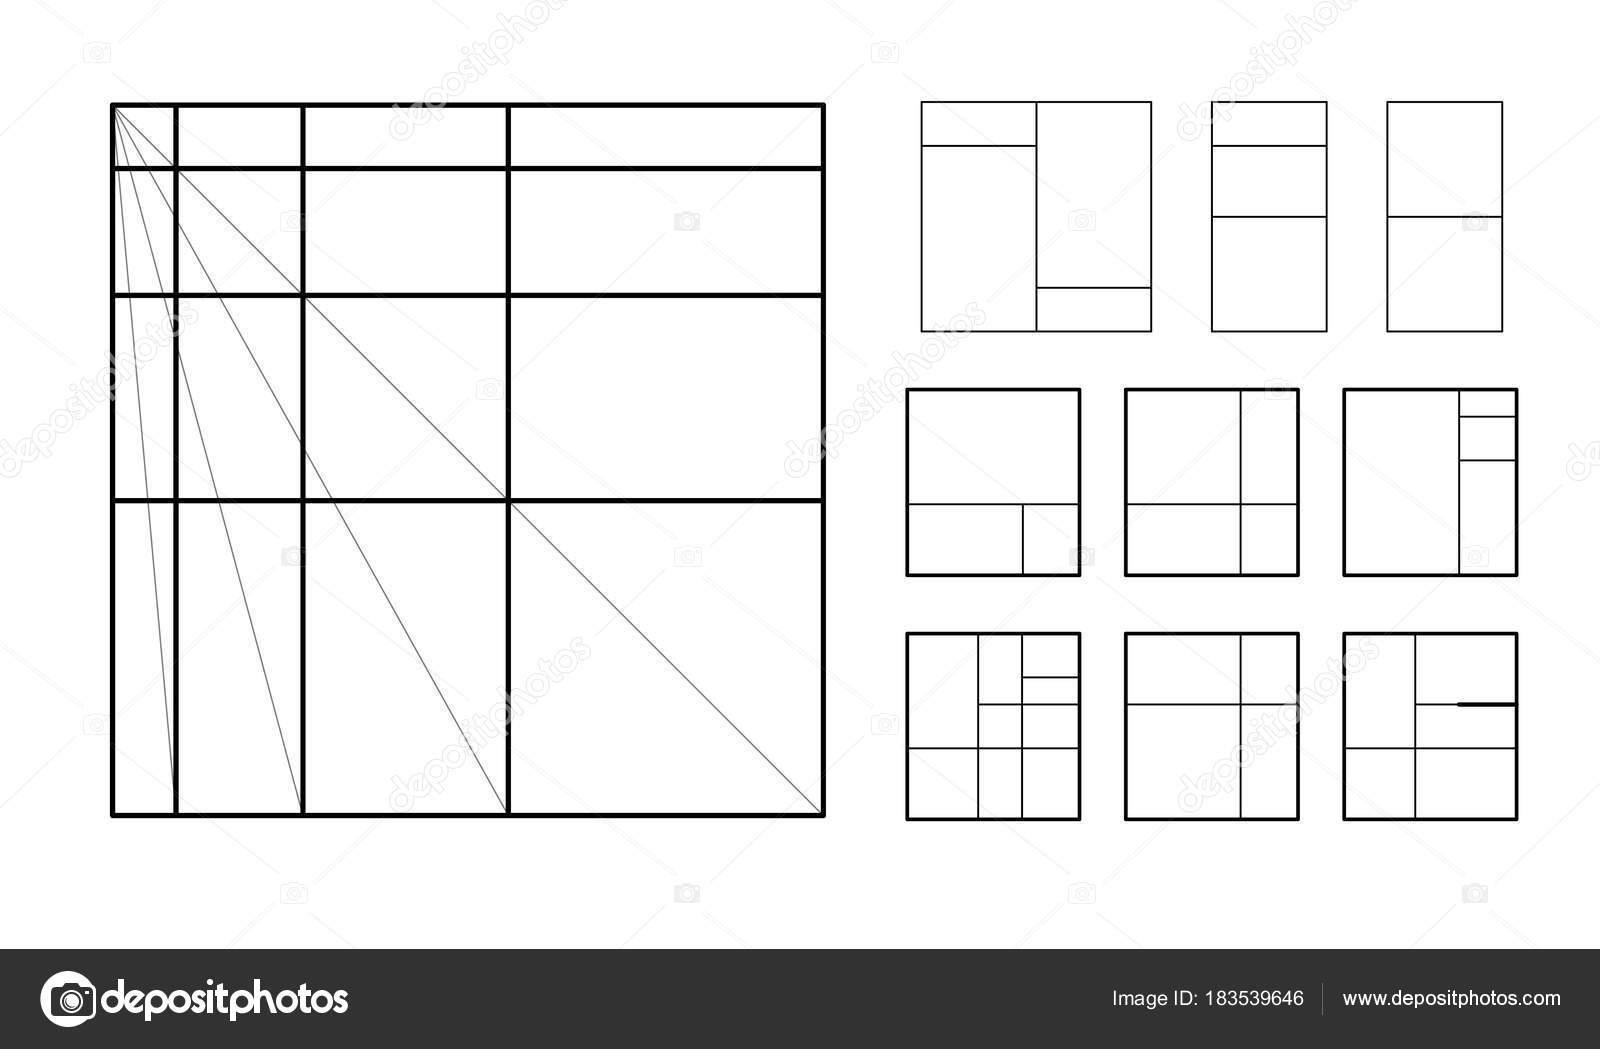 modulor le corbusier cover template harmonious measure to the human scale universally. Black Bedroom Furniture Sets. Home Design Ideas